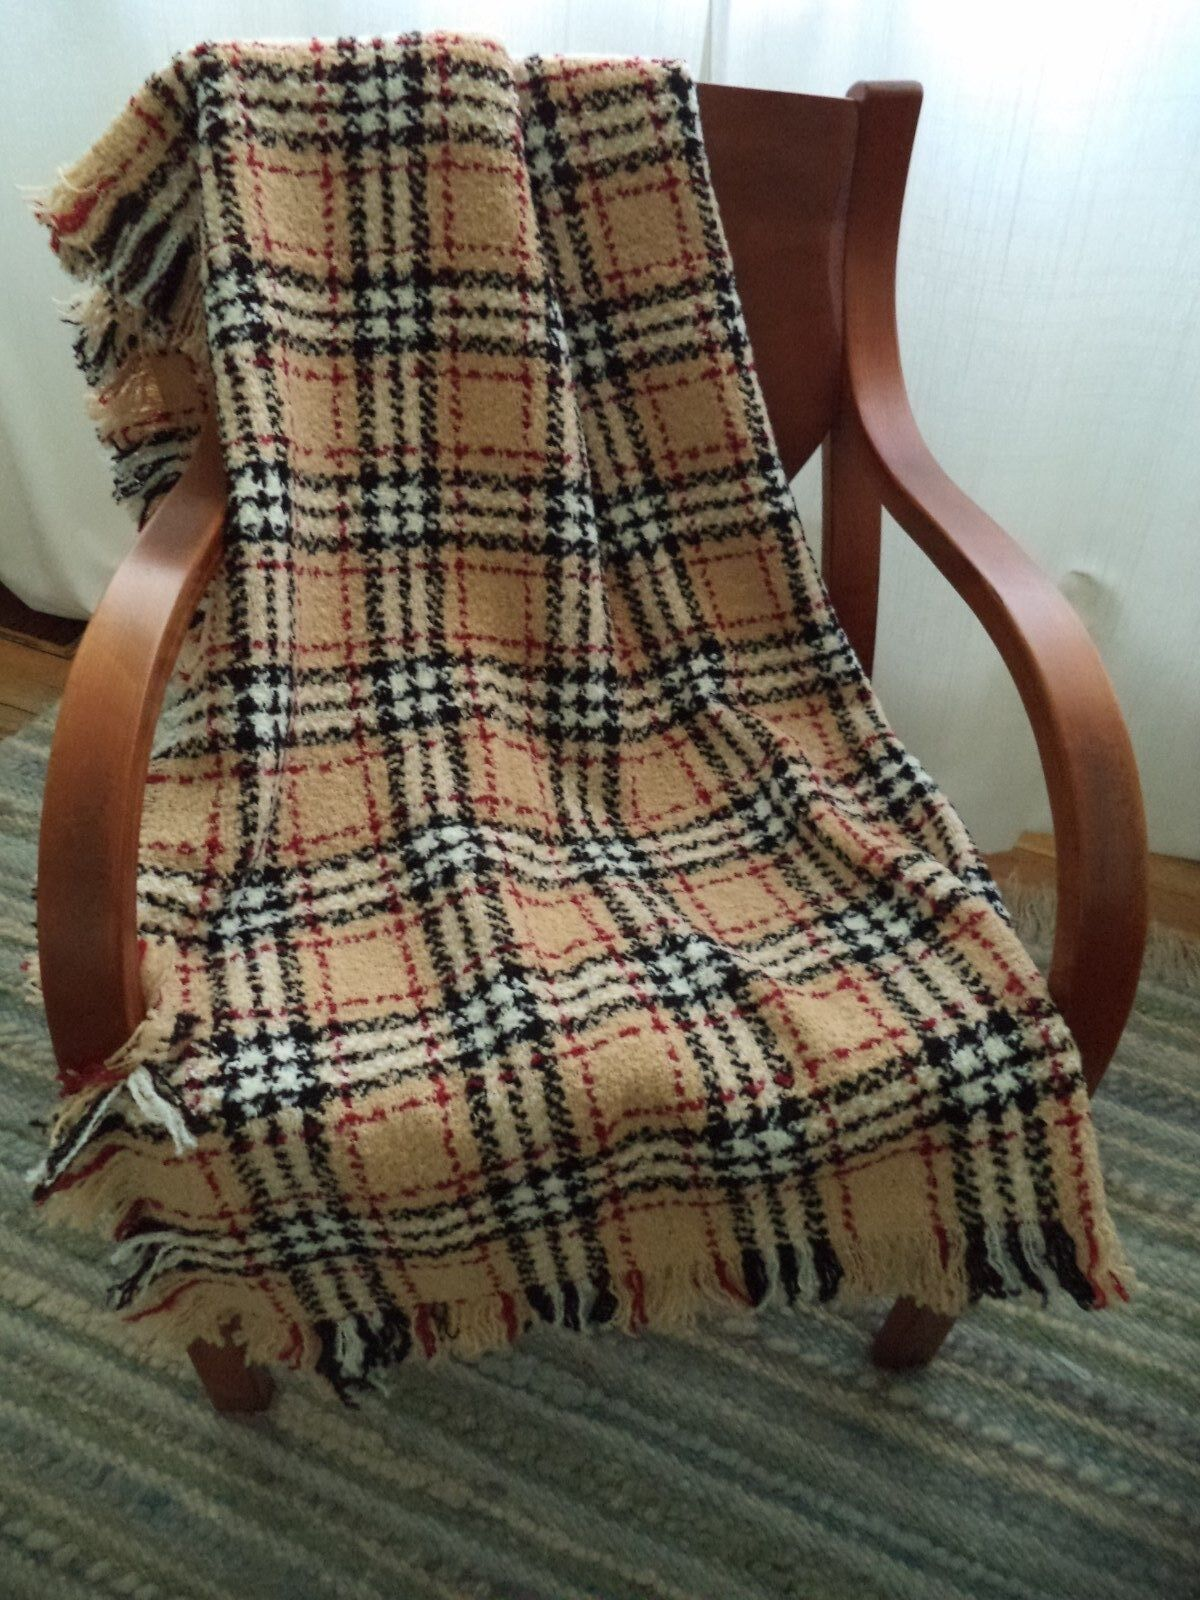 Irlandés Tartán Manta Cobertor Branigan Weavers Irlanda Camello Rojo Negro blancoo De Lana